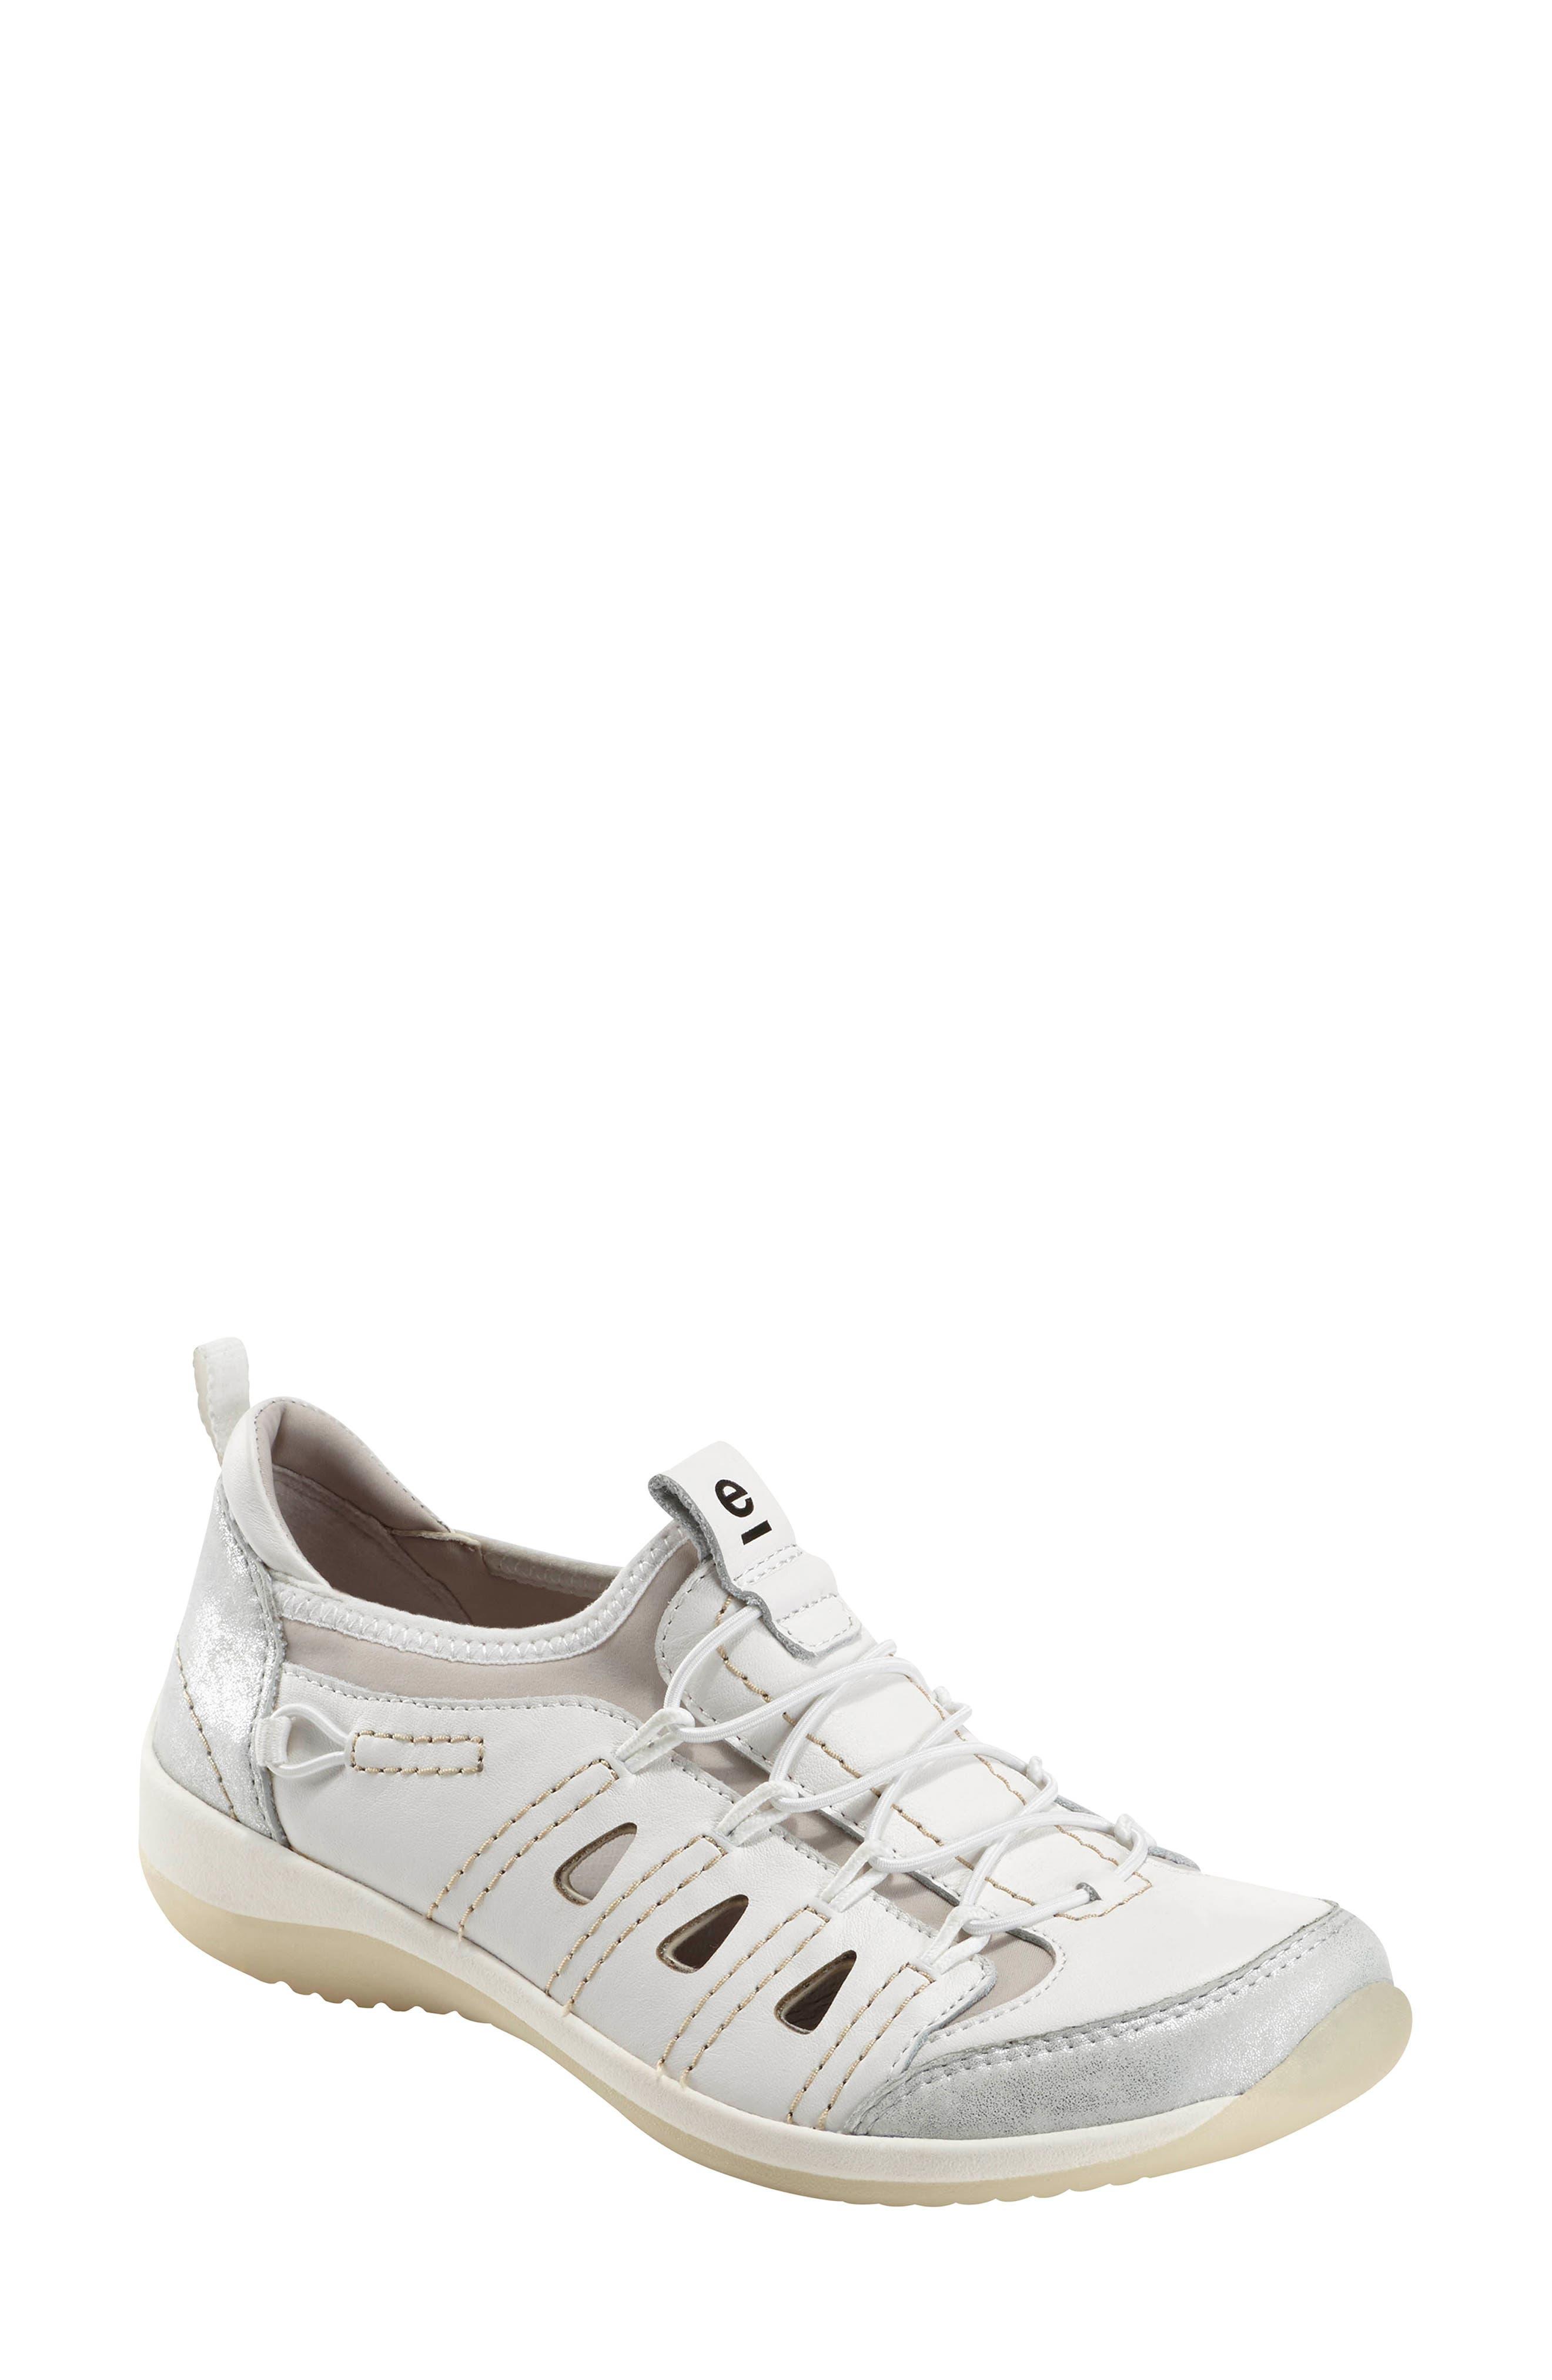 Earth Goodall Sneaker W - White